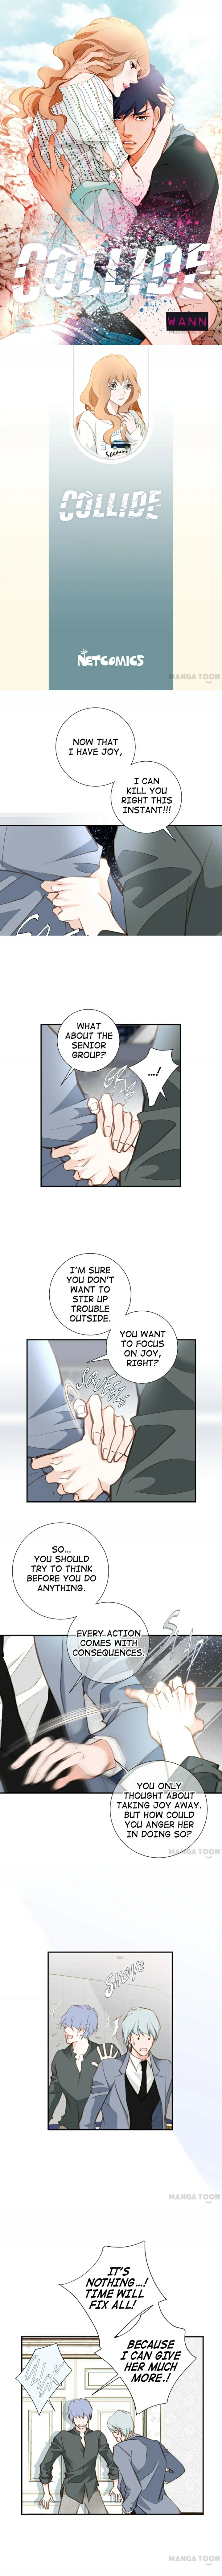 https://img2.nineanime.com/comics/pic2/4/27652/718350/2d1bafe55b0b49961617e5b71cbb1292.jpg Page 1